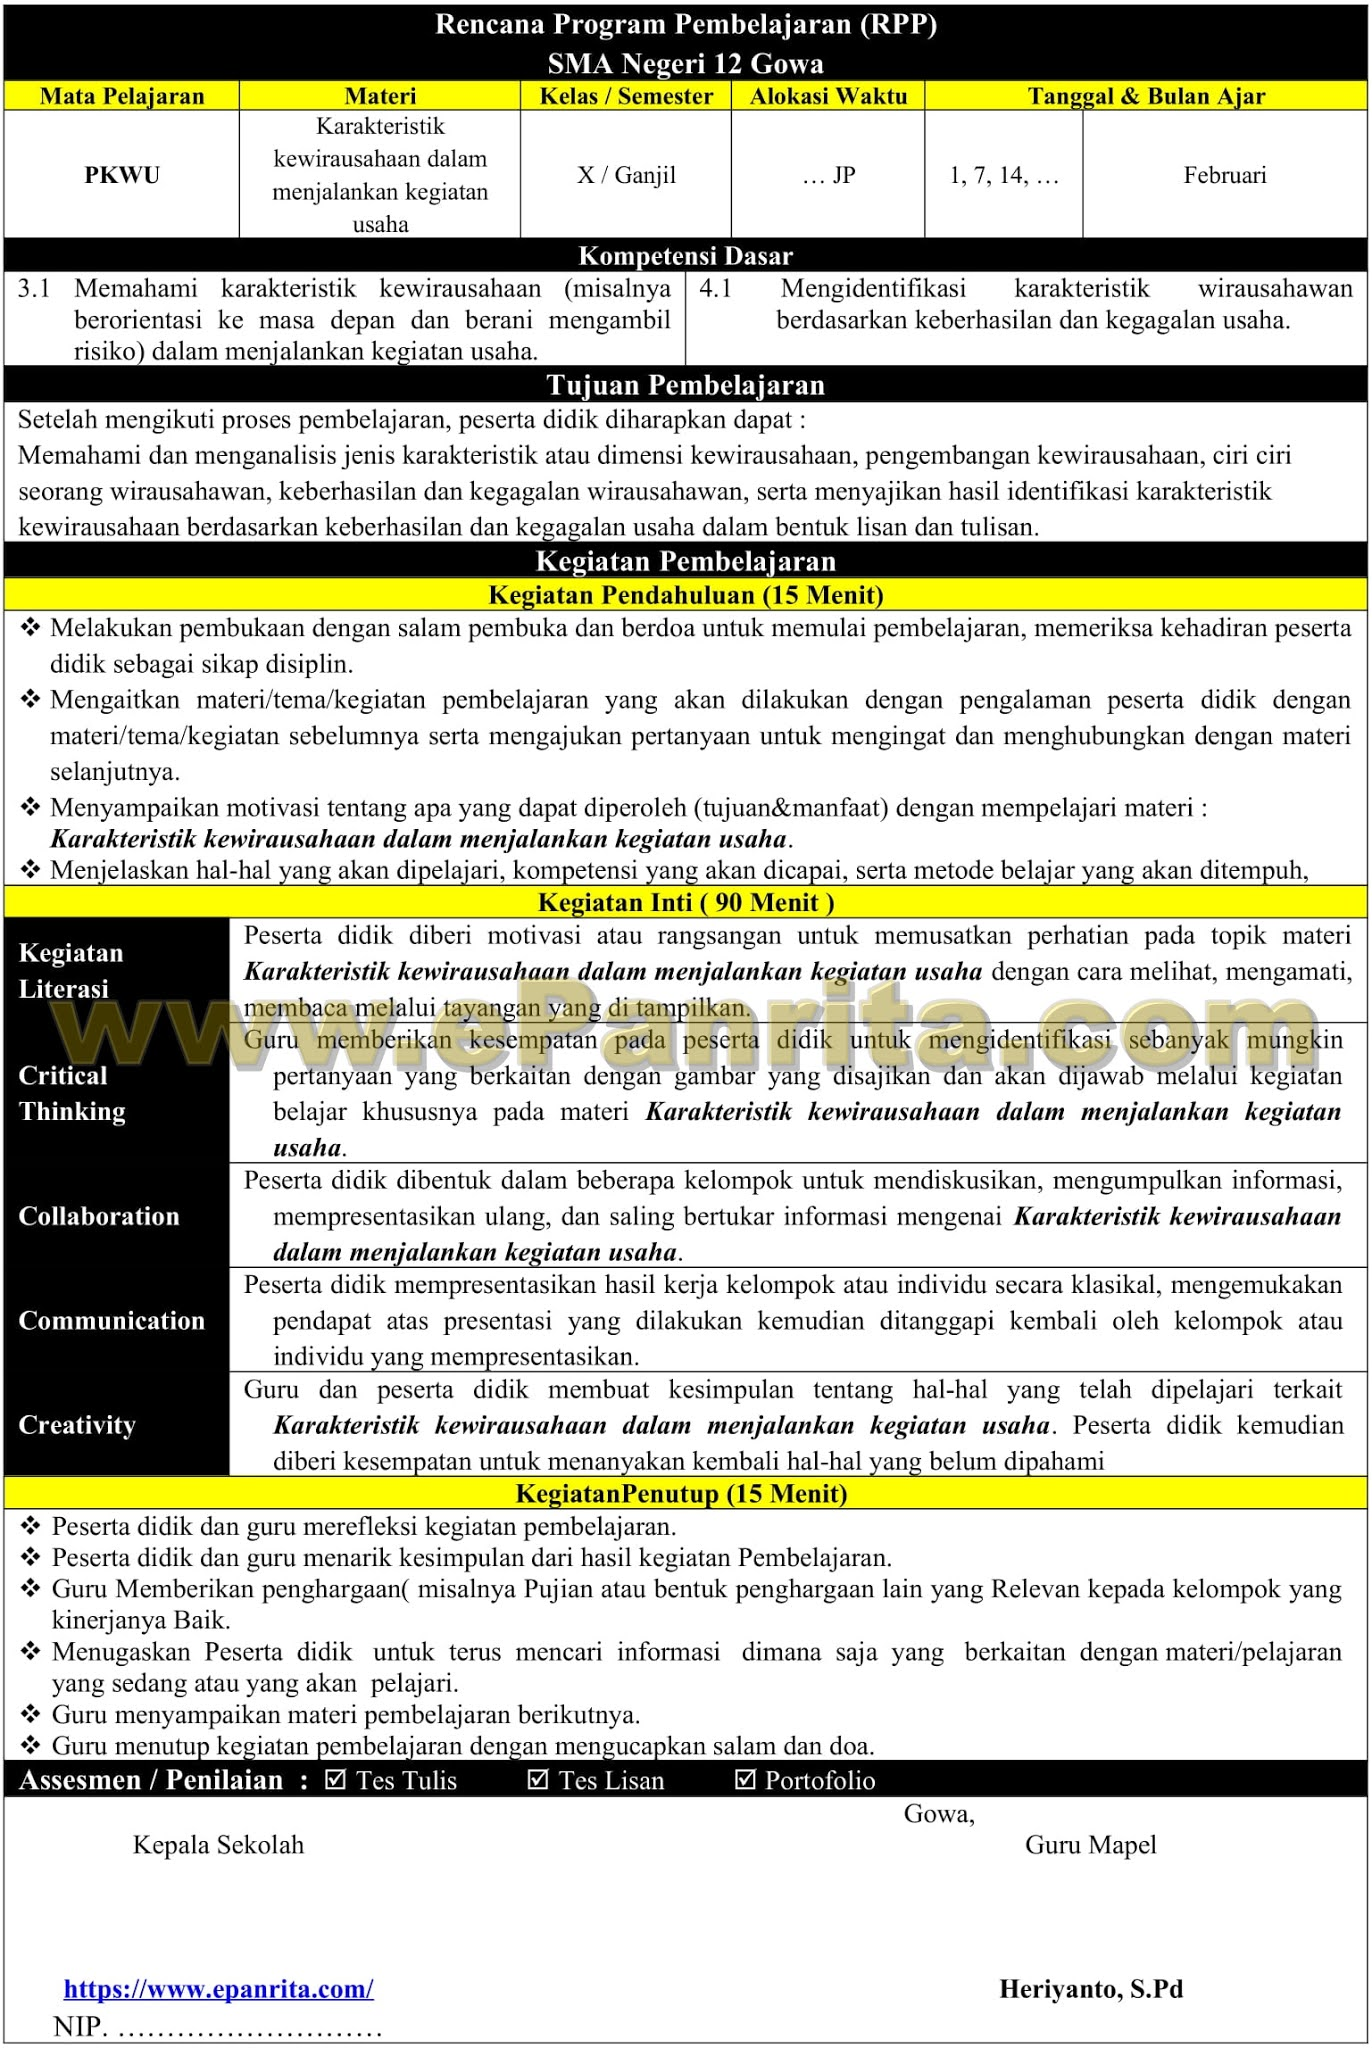 RPP 1 Halaman Prakarya Aspek Rekayasa (Karakteristik kewirausahaan dalam menjalankan kegiatan usaha)